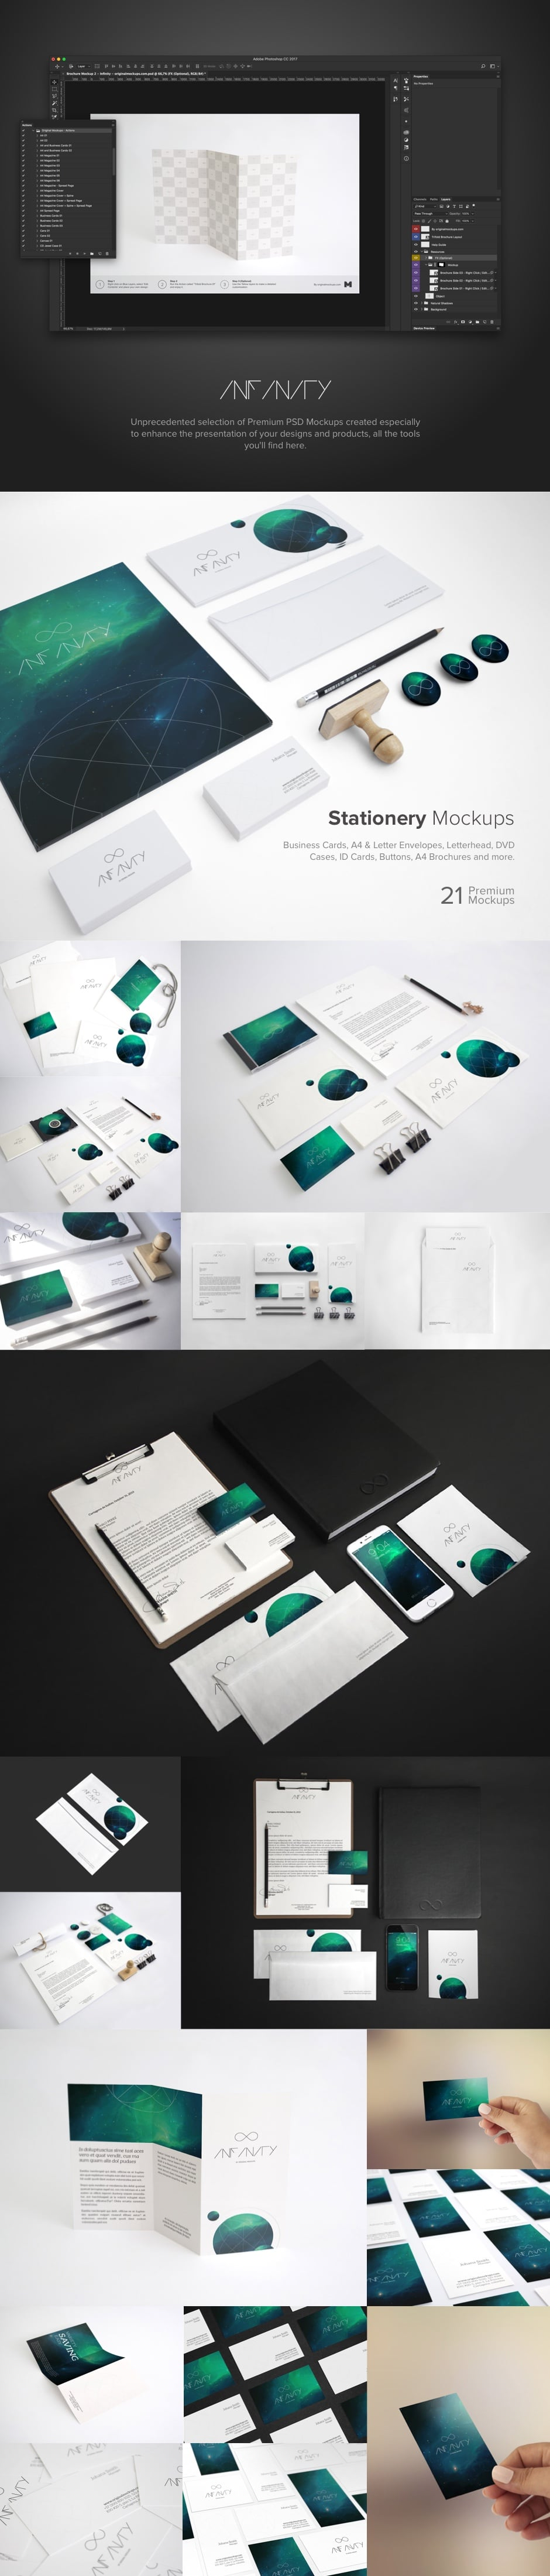 Infinity Branding Template Mockup